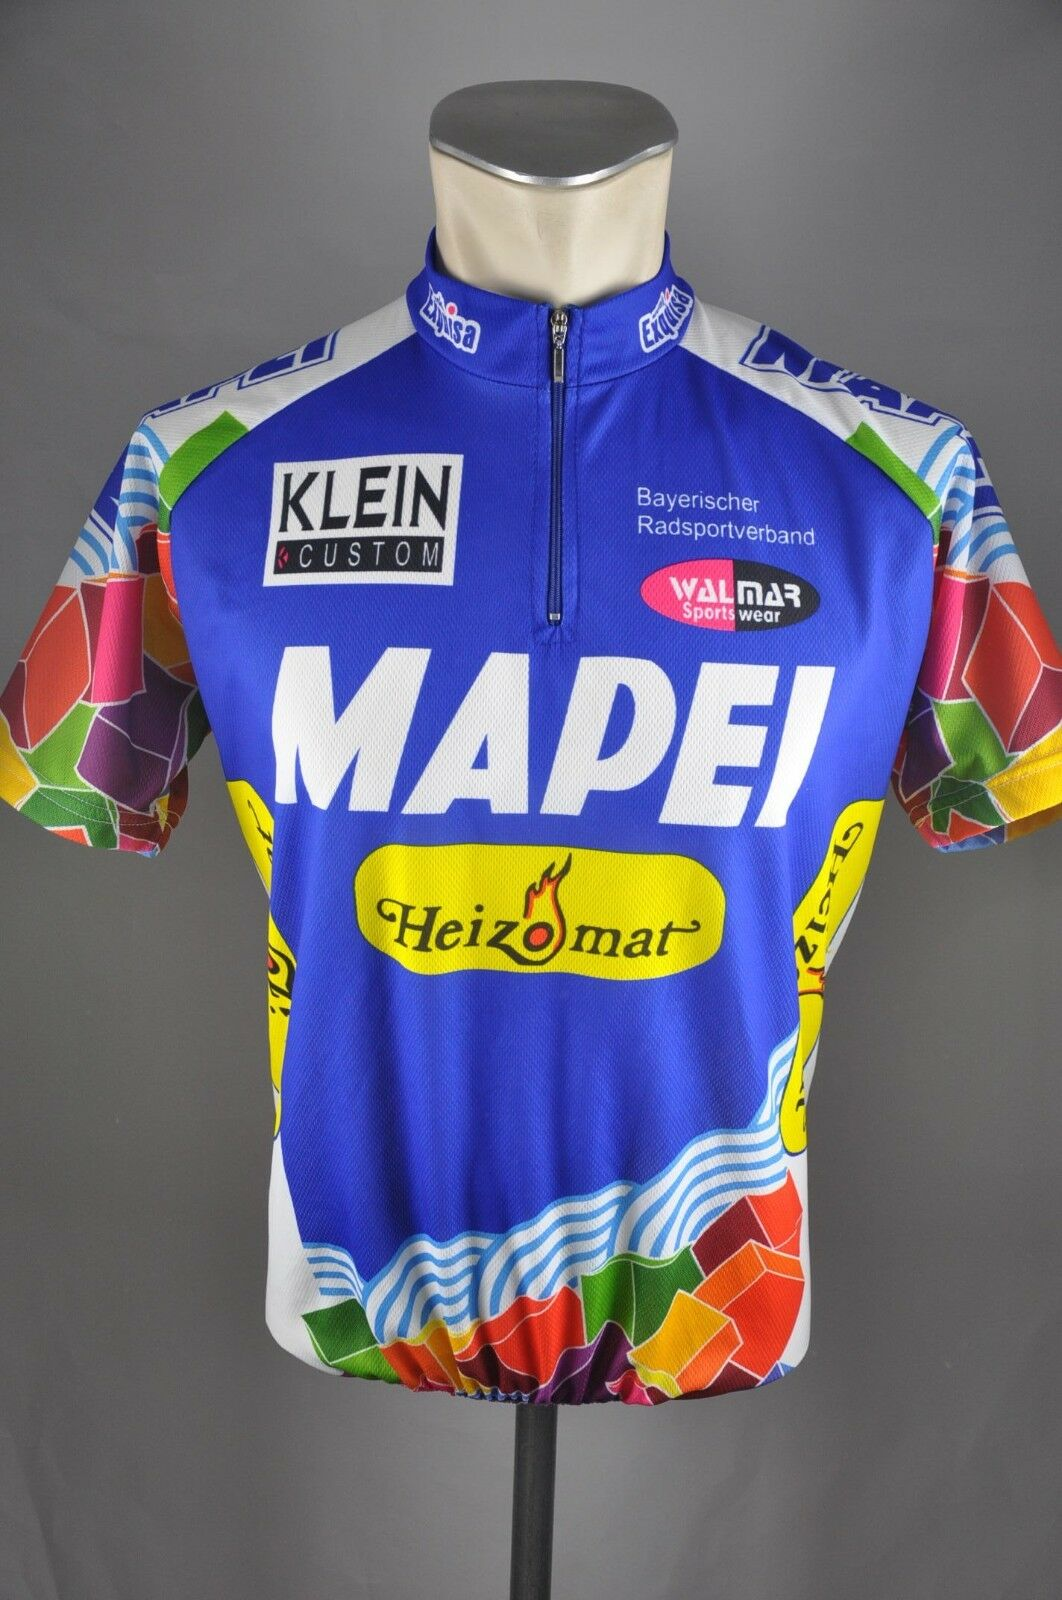 Mapei Bayerischer RSV Trikot Trikot RSV Gr. M 54cm Fahrrad bike maglia cycling jersey L2 5f8659